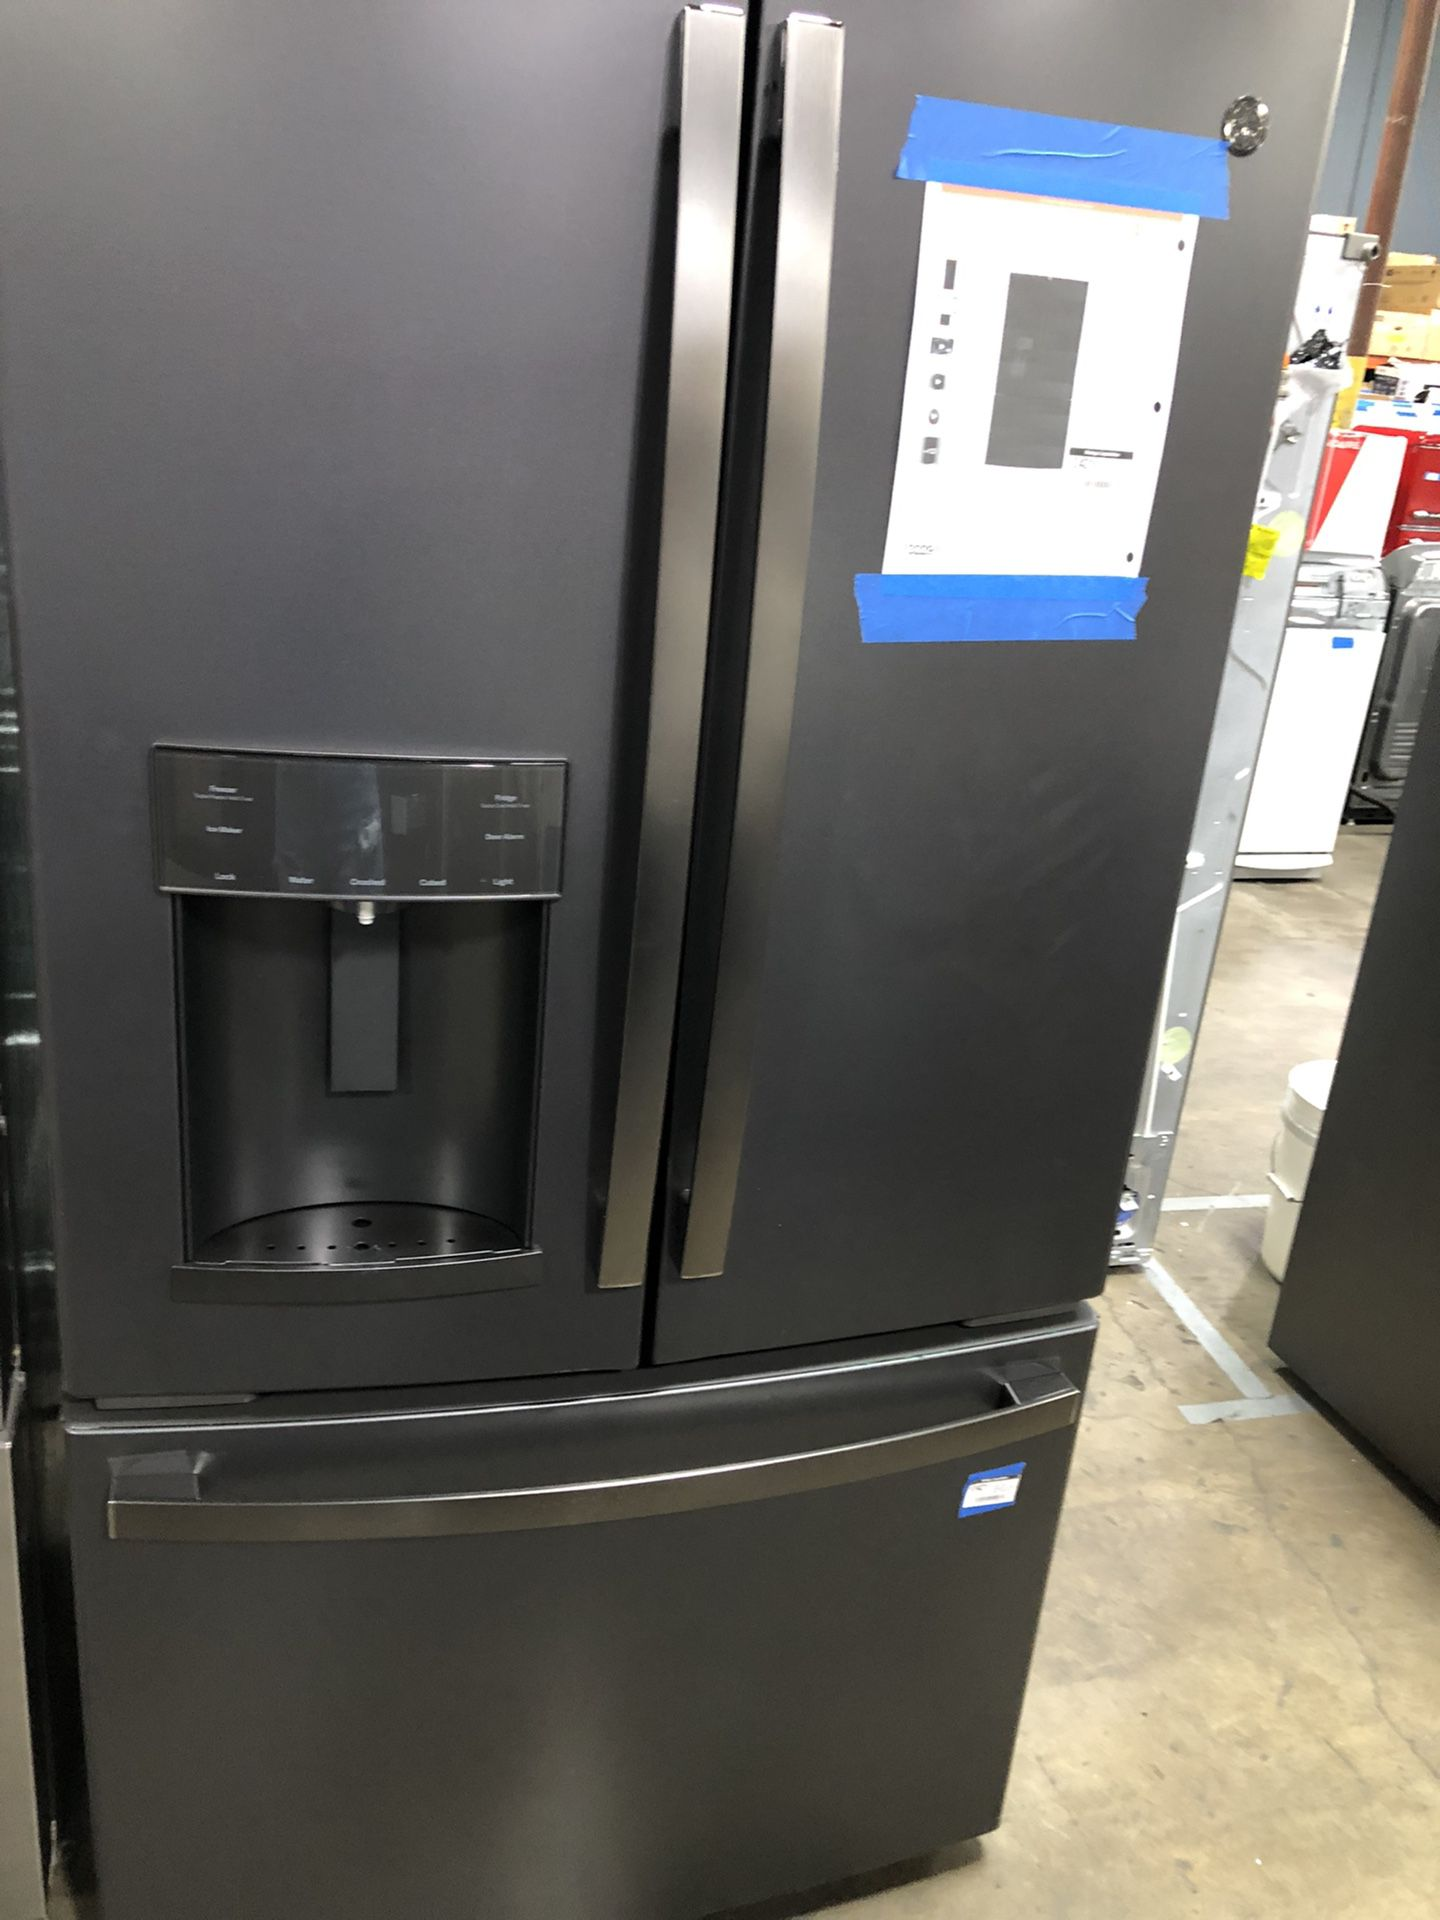 🔥😍🤯 GE 22.1 cu. ft. French Door Refrigerator in Black Slate Fingerprint